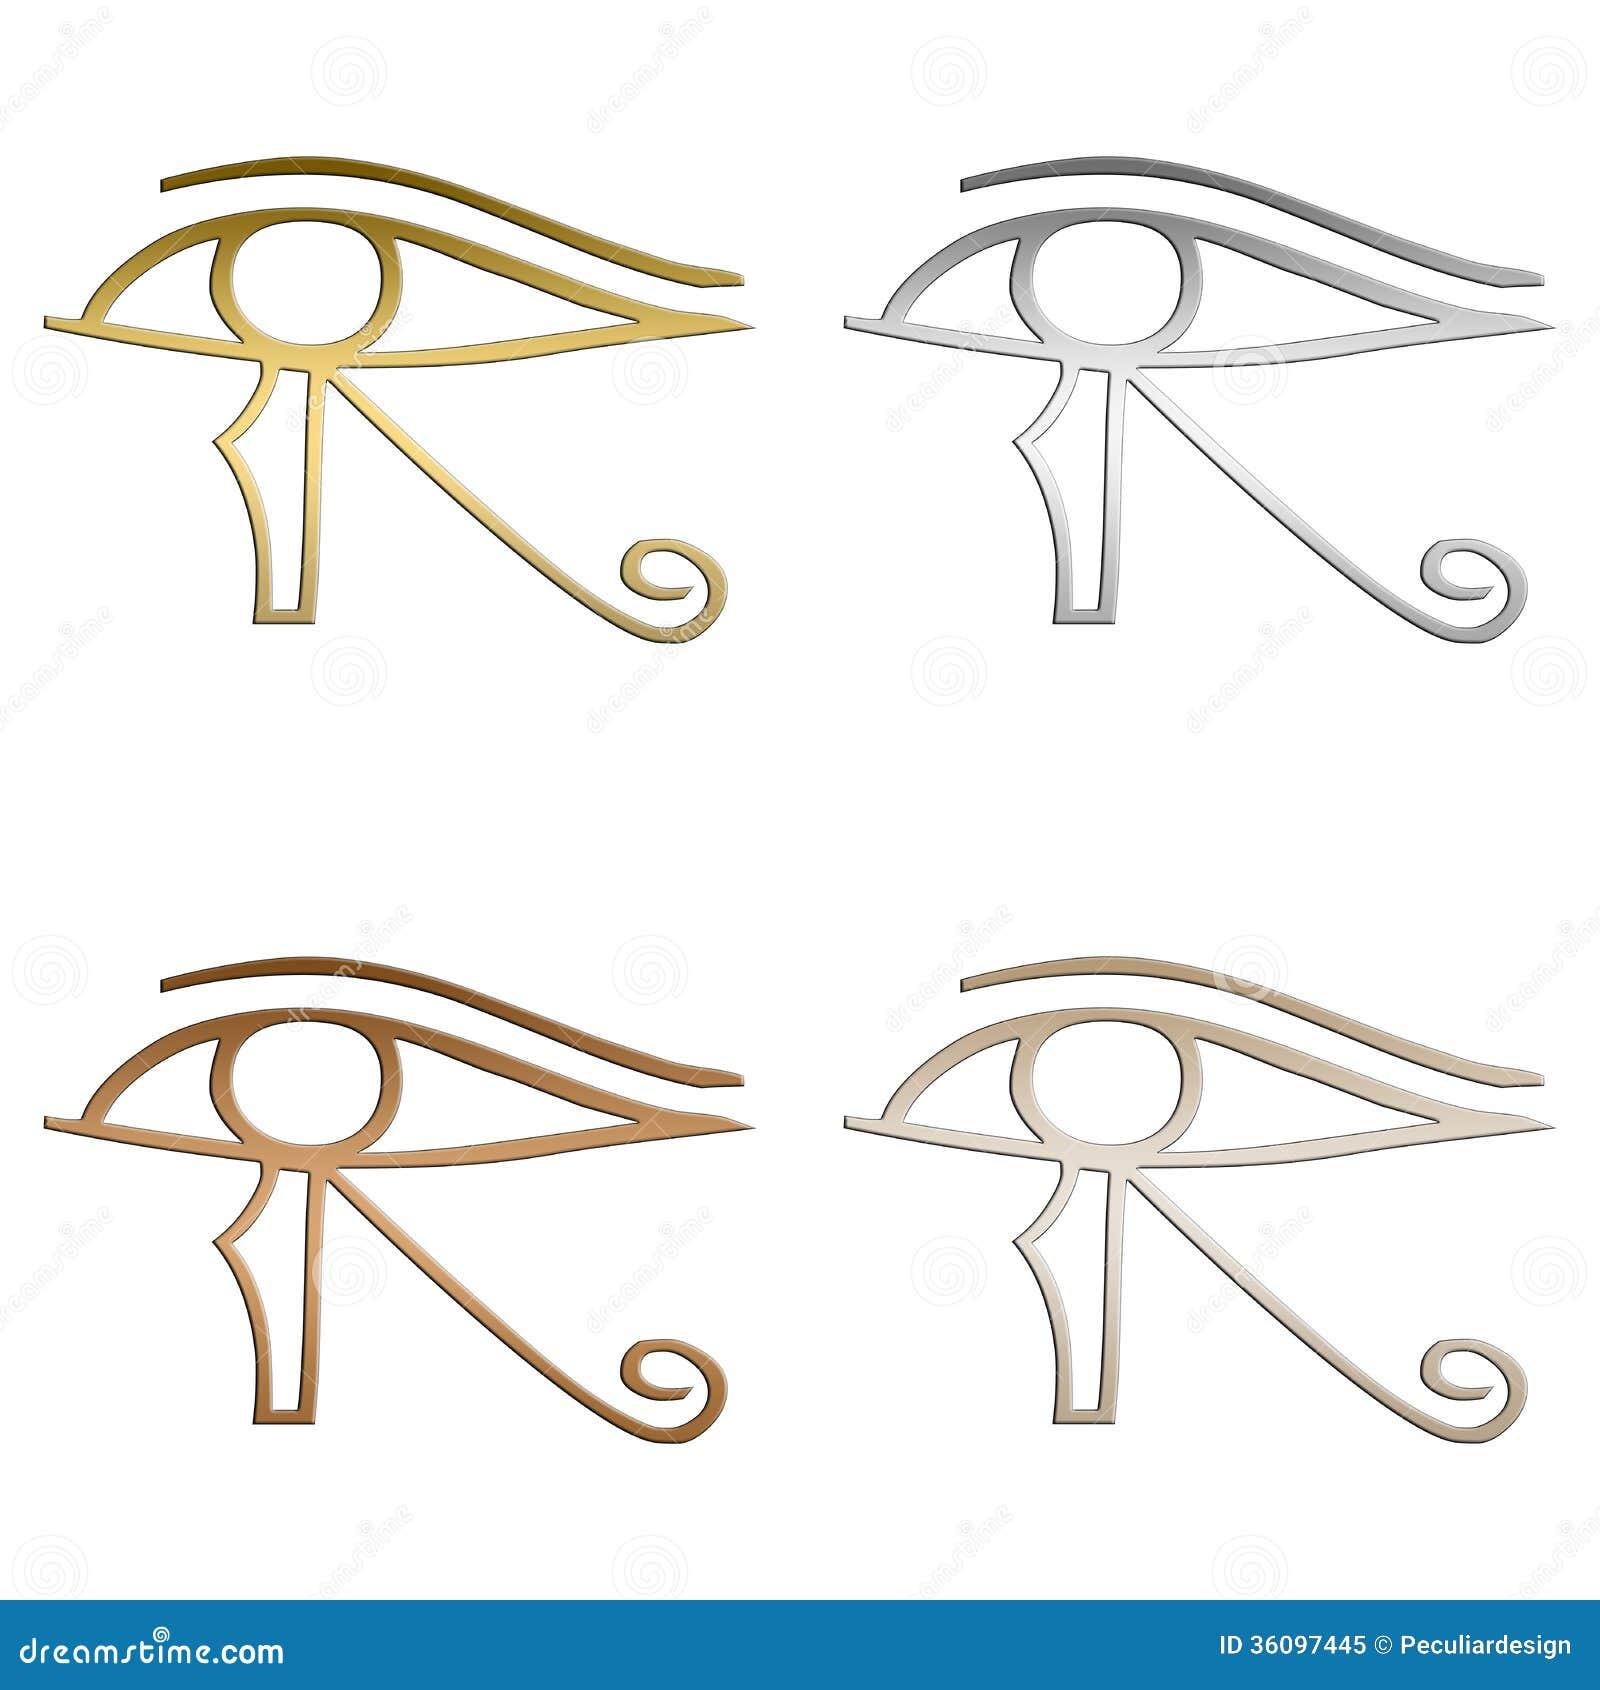 Eye Of Horus Stock Image Illustration Of Egyptians Horus 36097445